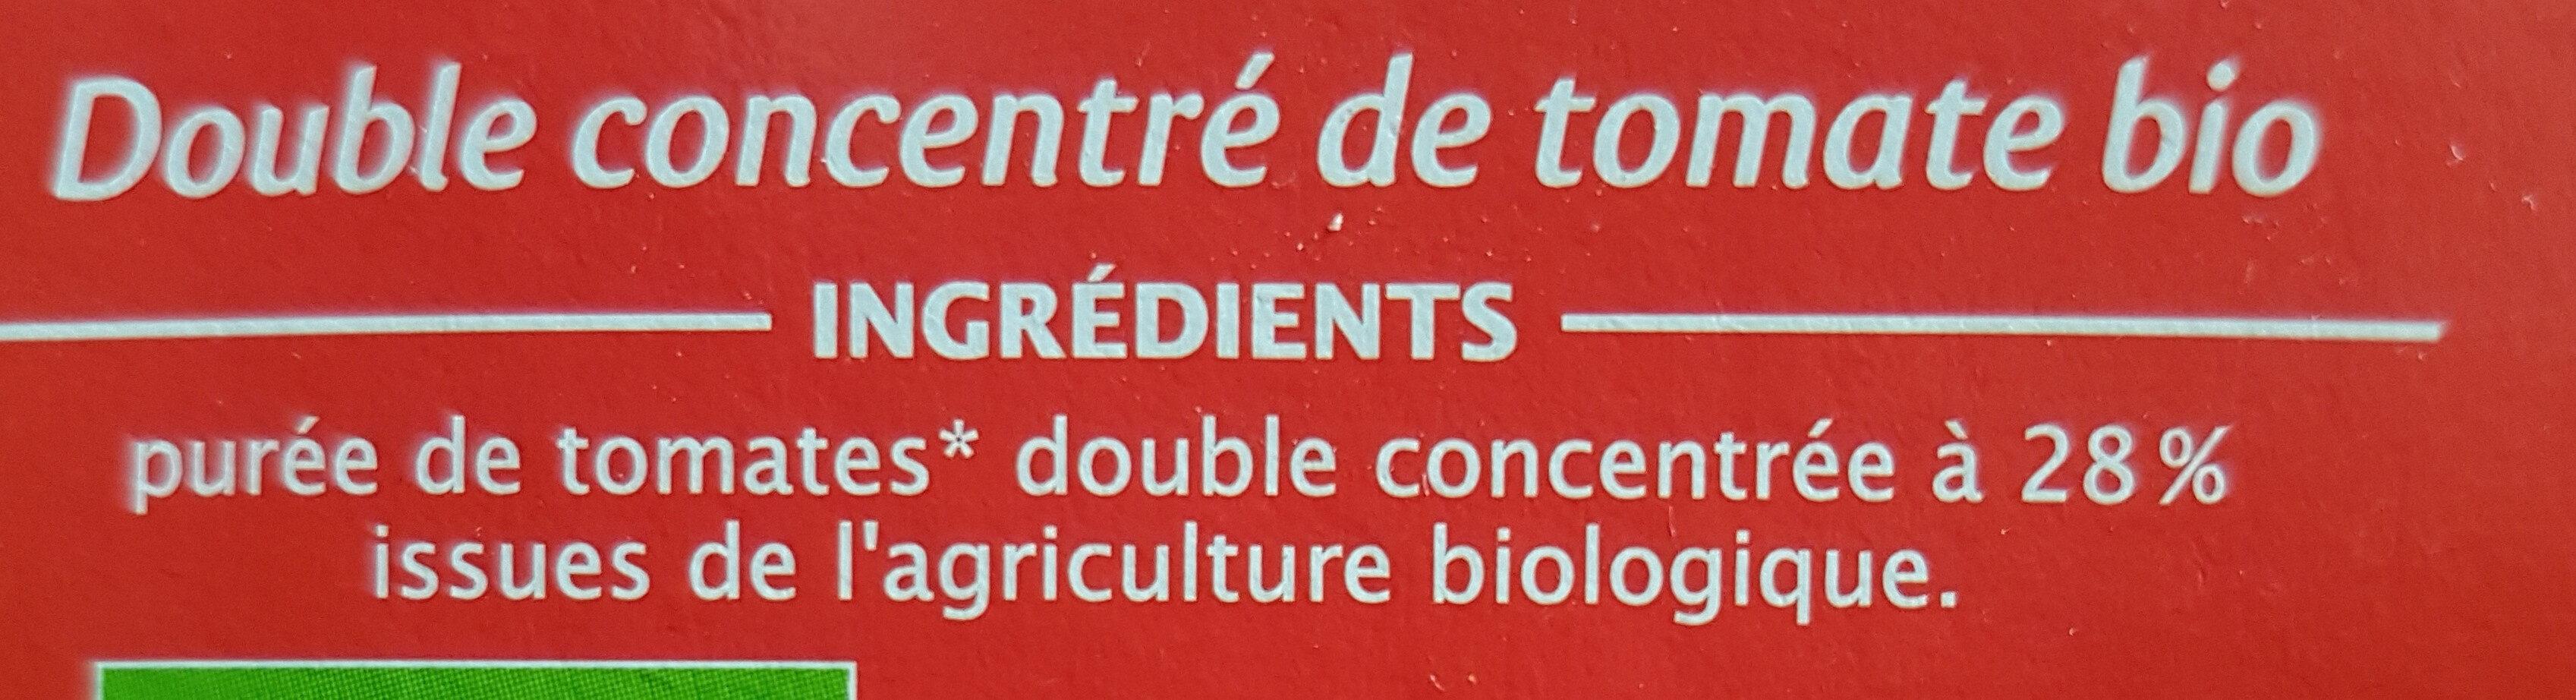 Double concentré de tomate Bio (28%) (Voir 2000000002768) - Ingrediënten